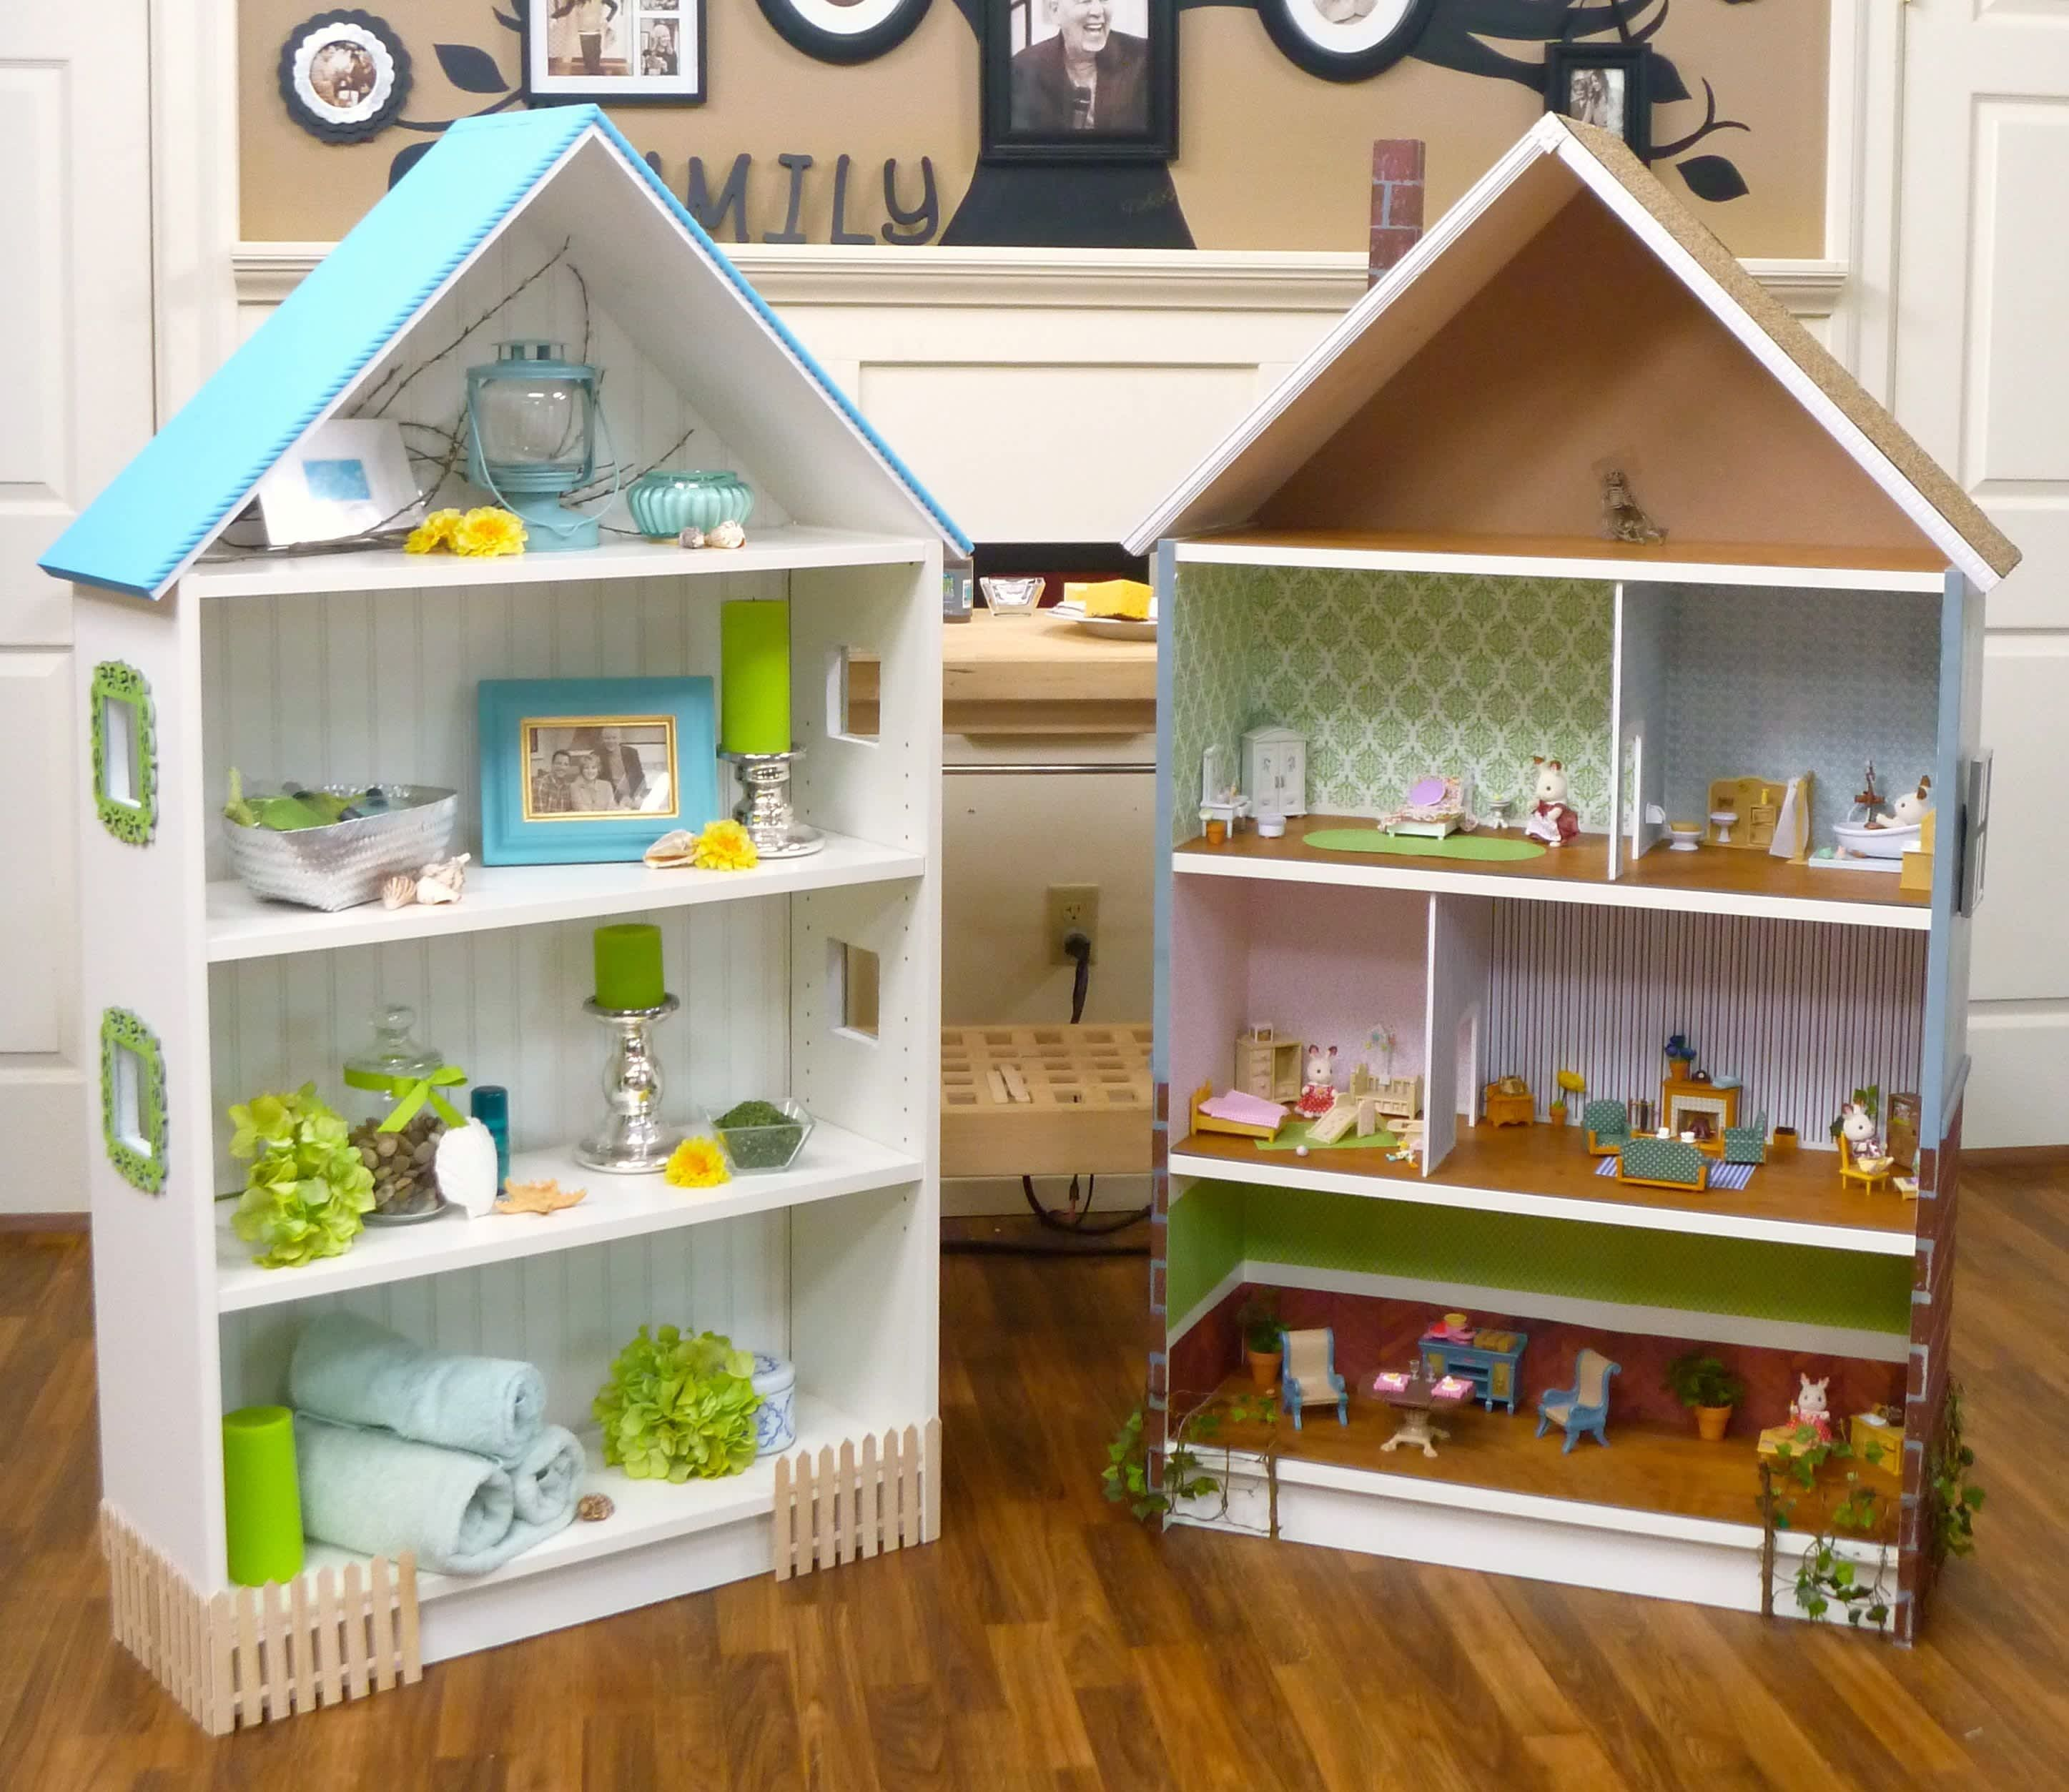 10 Ikea Products Turned Into Dollhouses Dengan Gambar Rumah Barbie Rumah Boneka Kamar Bermain